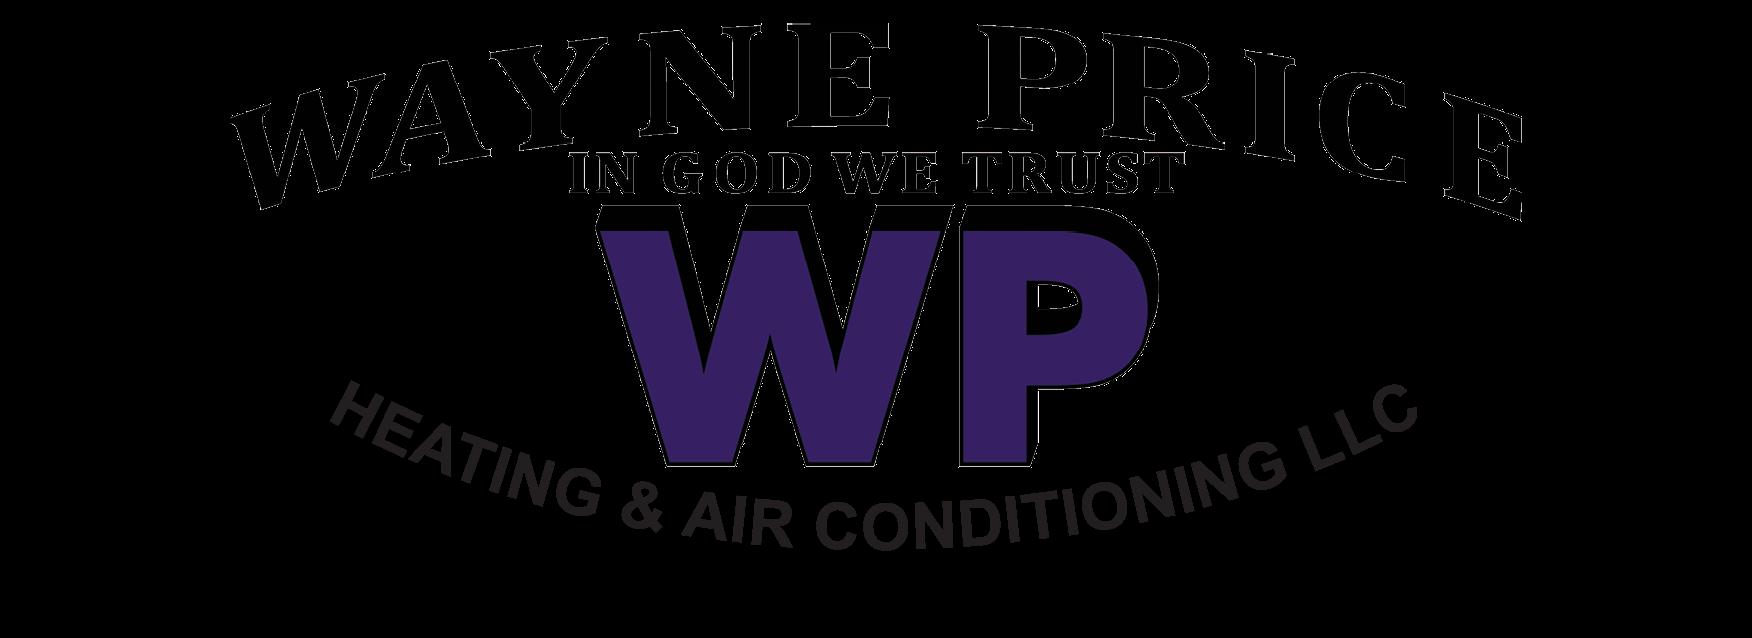 Wayne Price Heating & Air Conditioning LLC